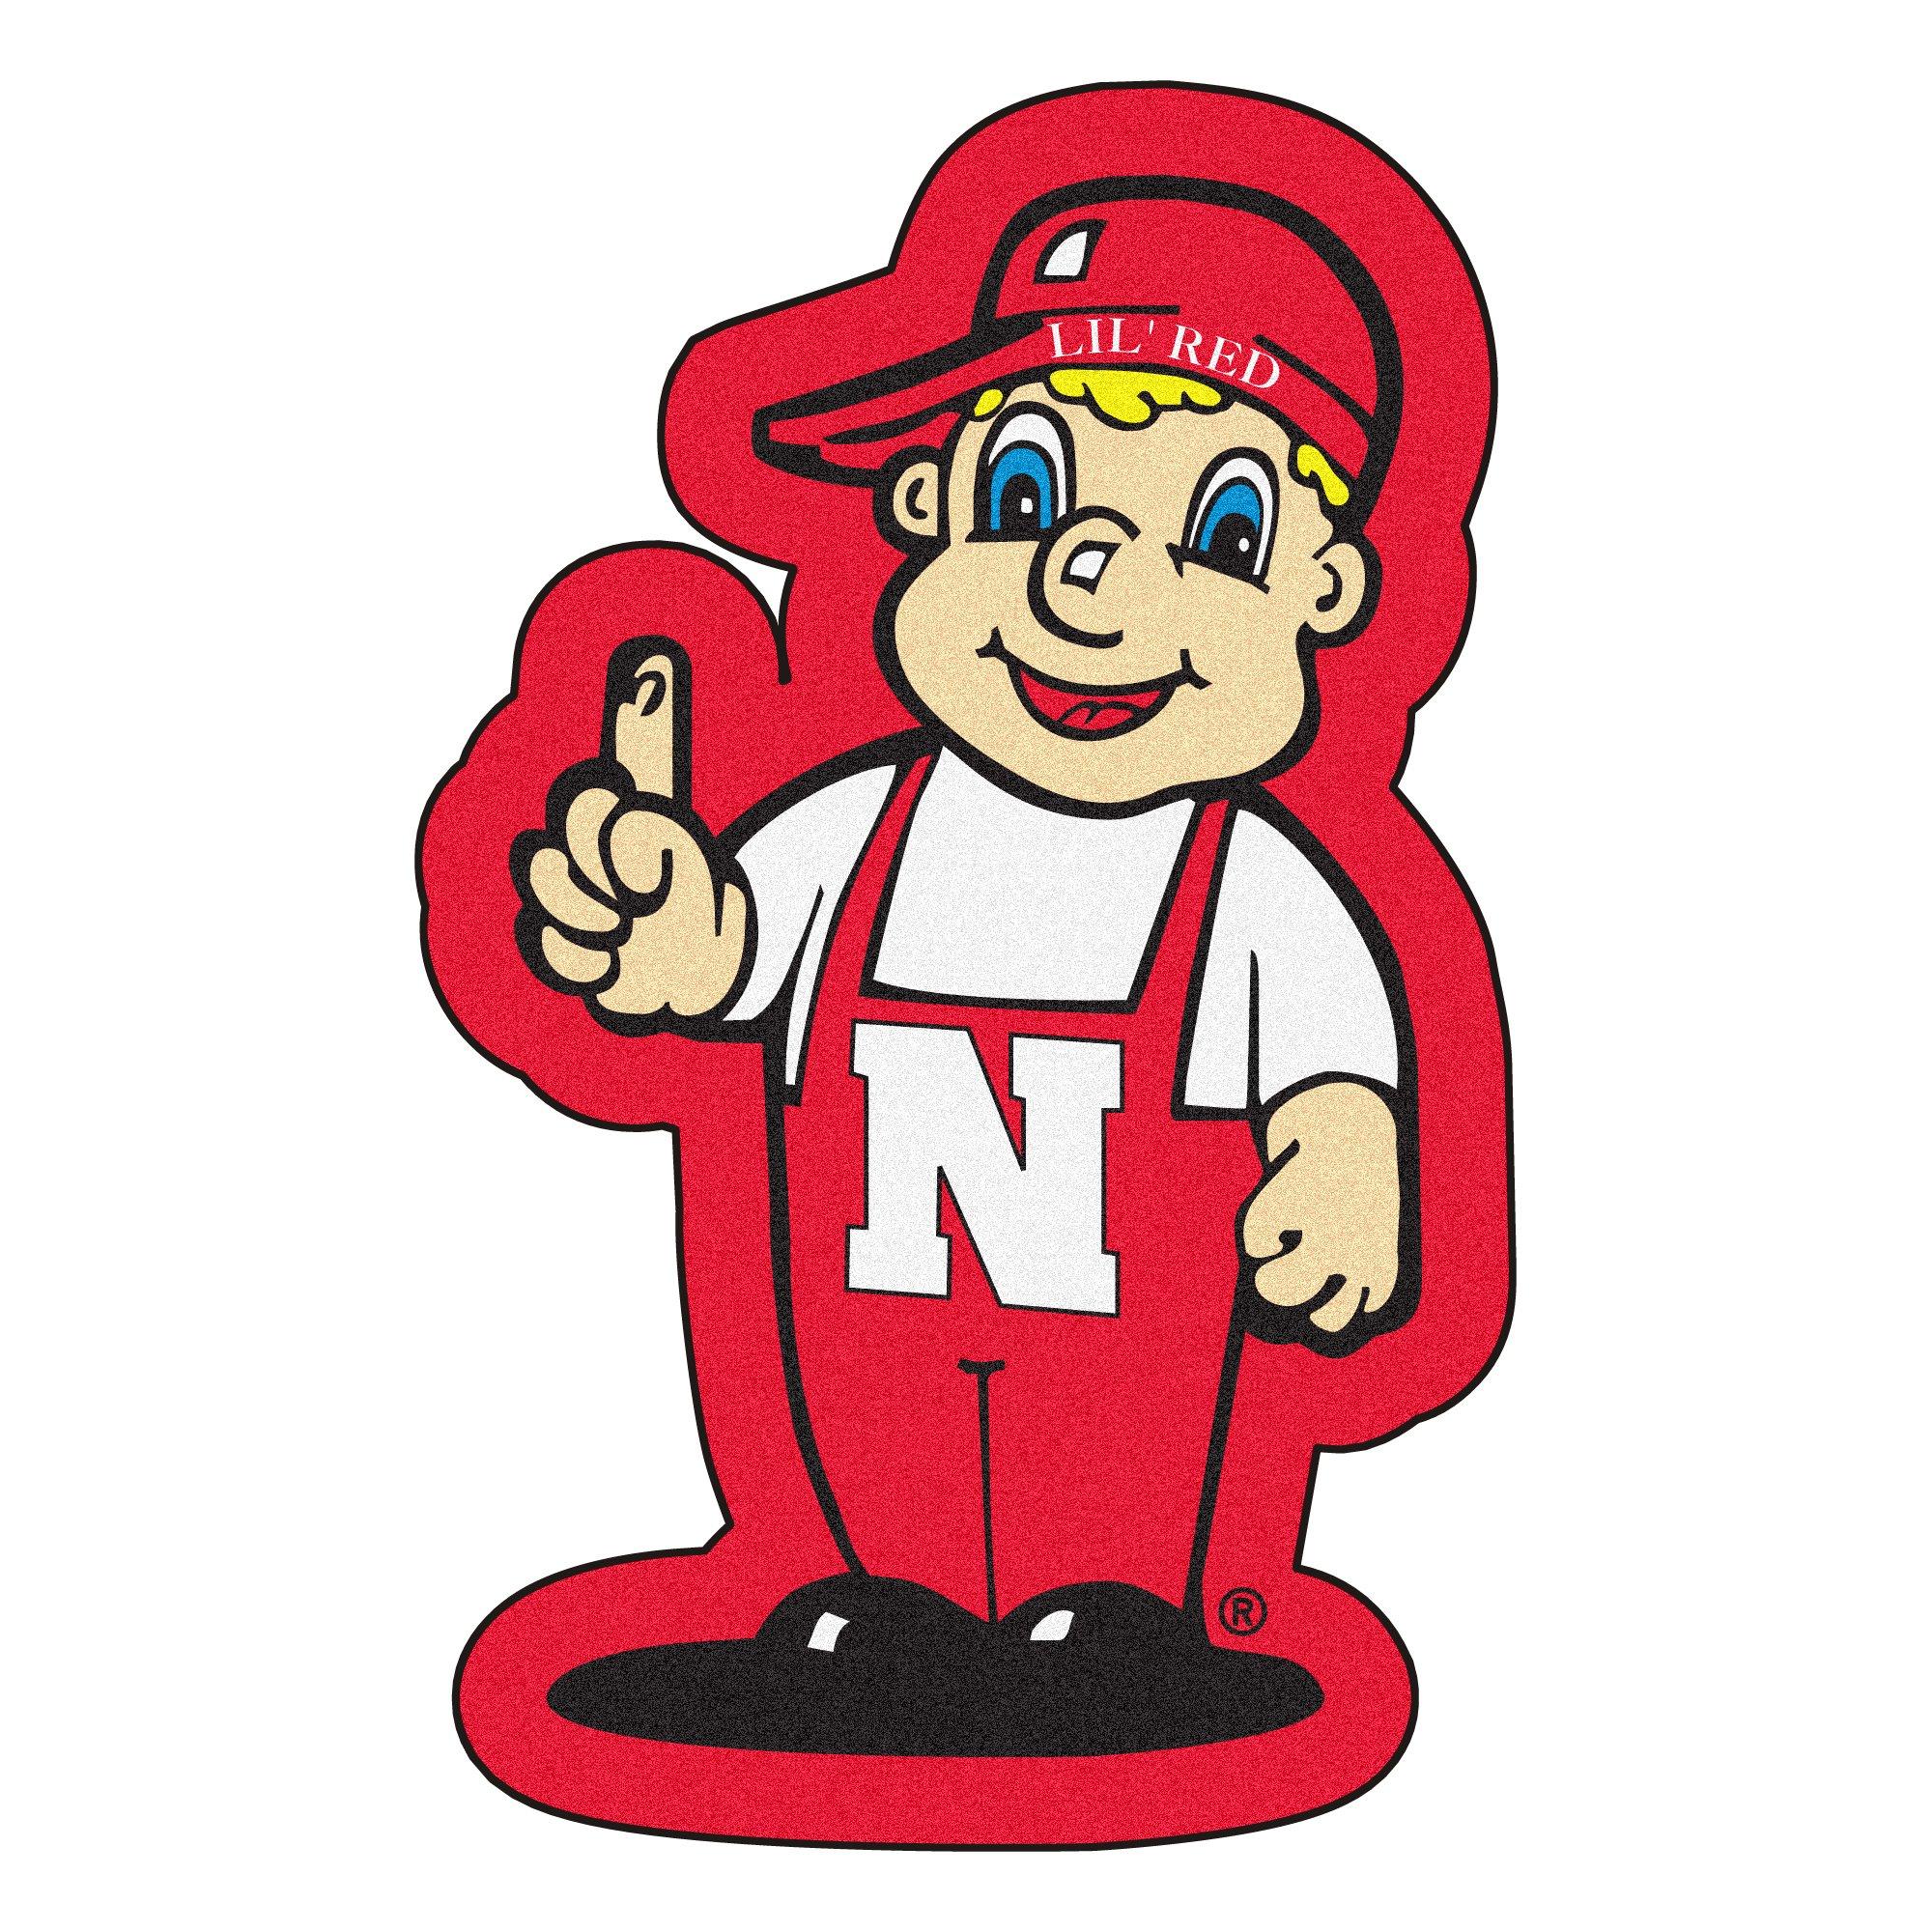 FANMATS NCAA University of Nebraska Cornhuskers Nylon Face Mascot Rug by FANMATS